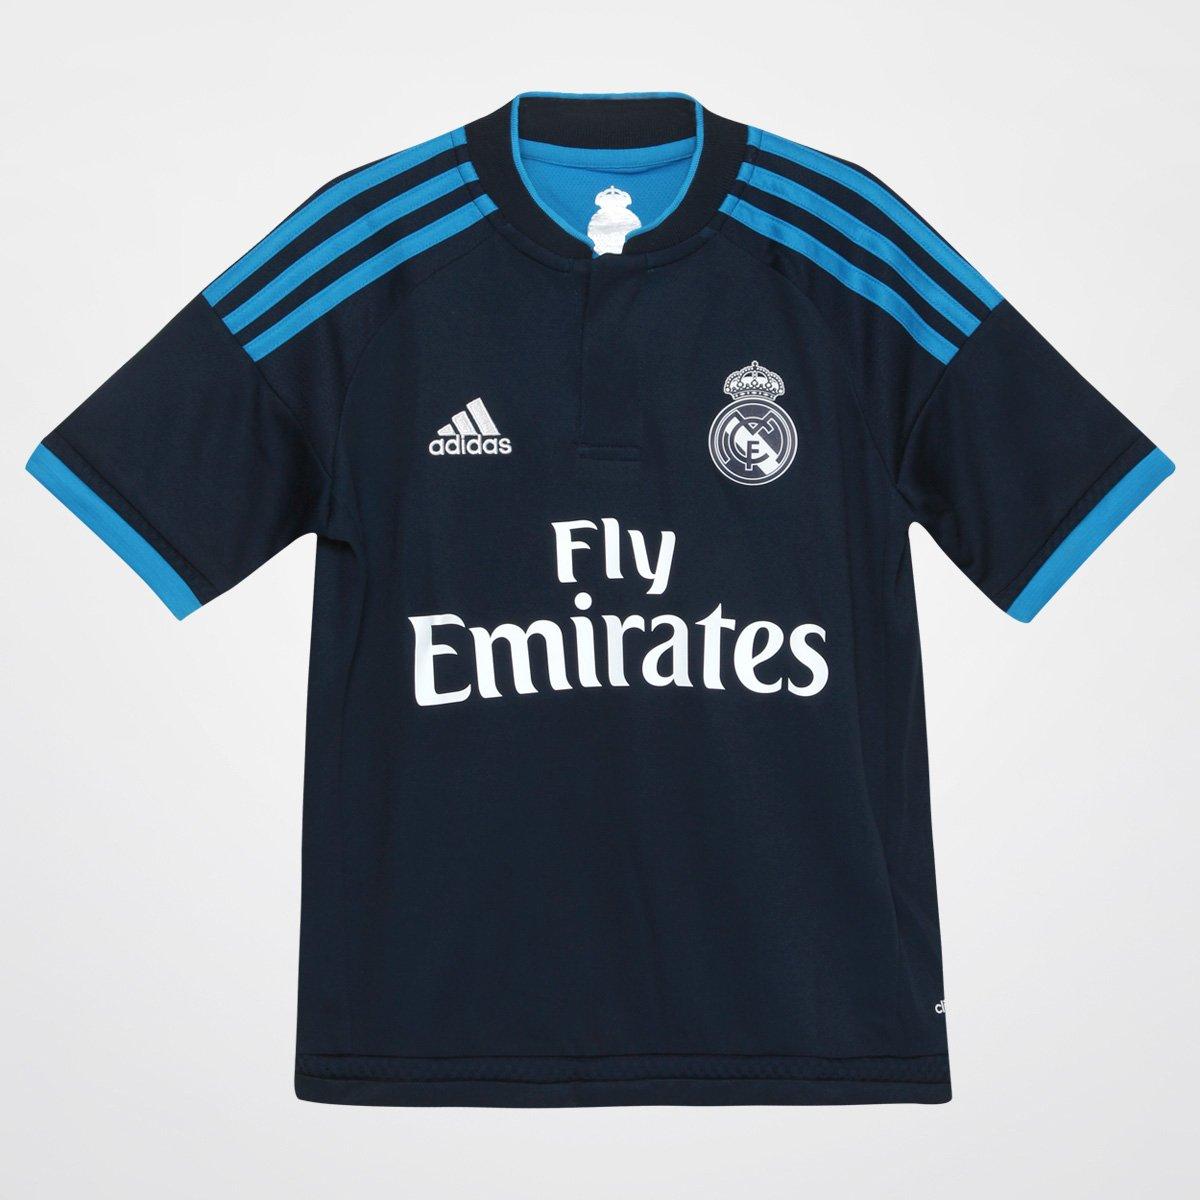 Camisa Real Madrid Infantil Third 15 16 s nº - Torcedor Adidas - Compre  Agora  d7107e5b0d9bb